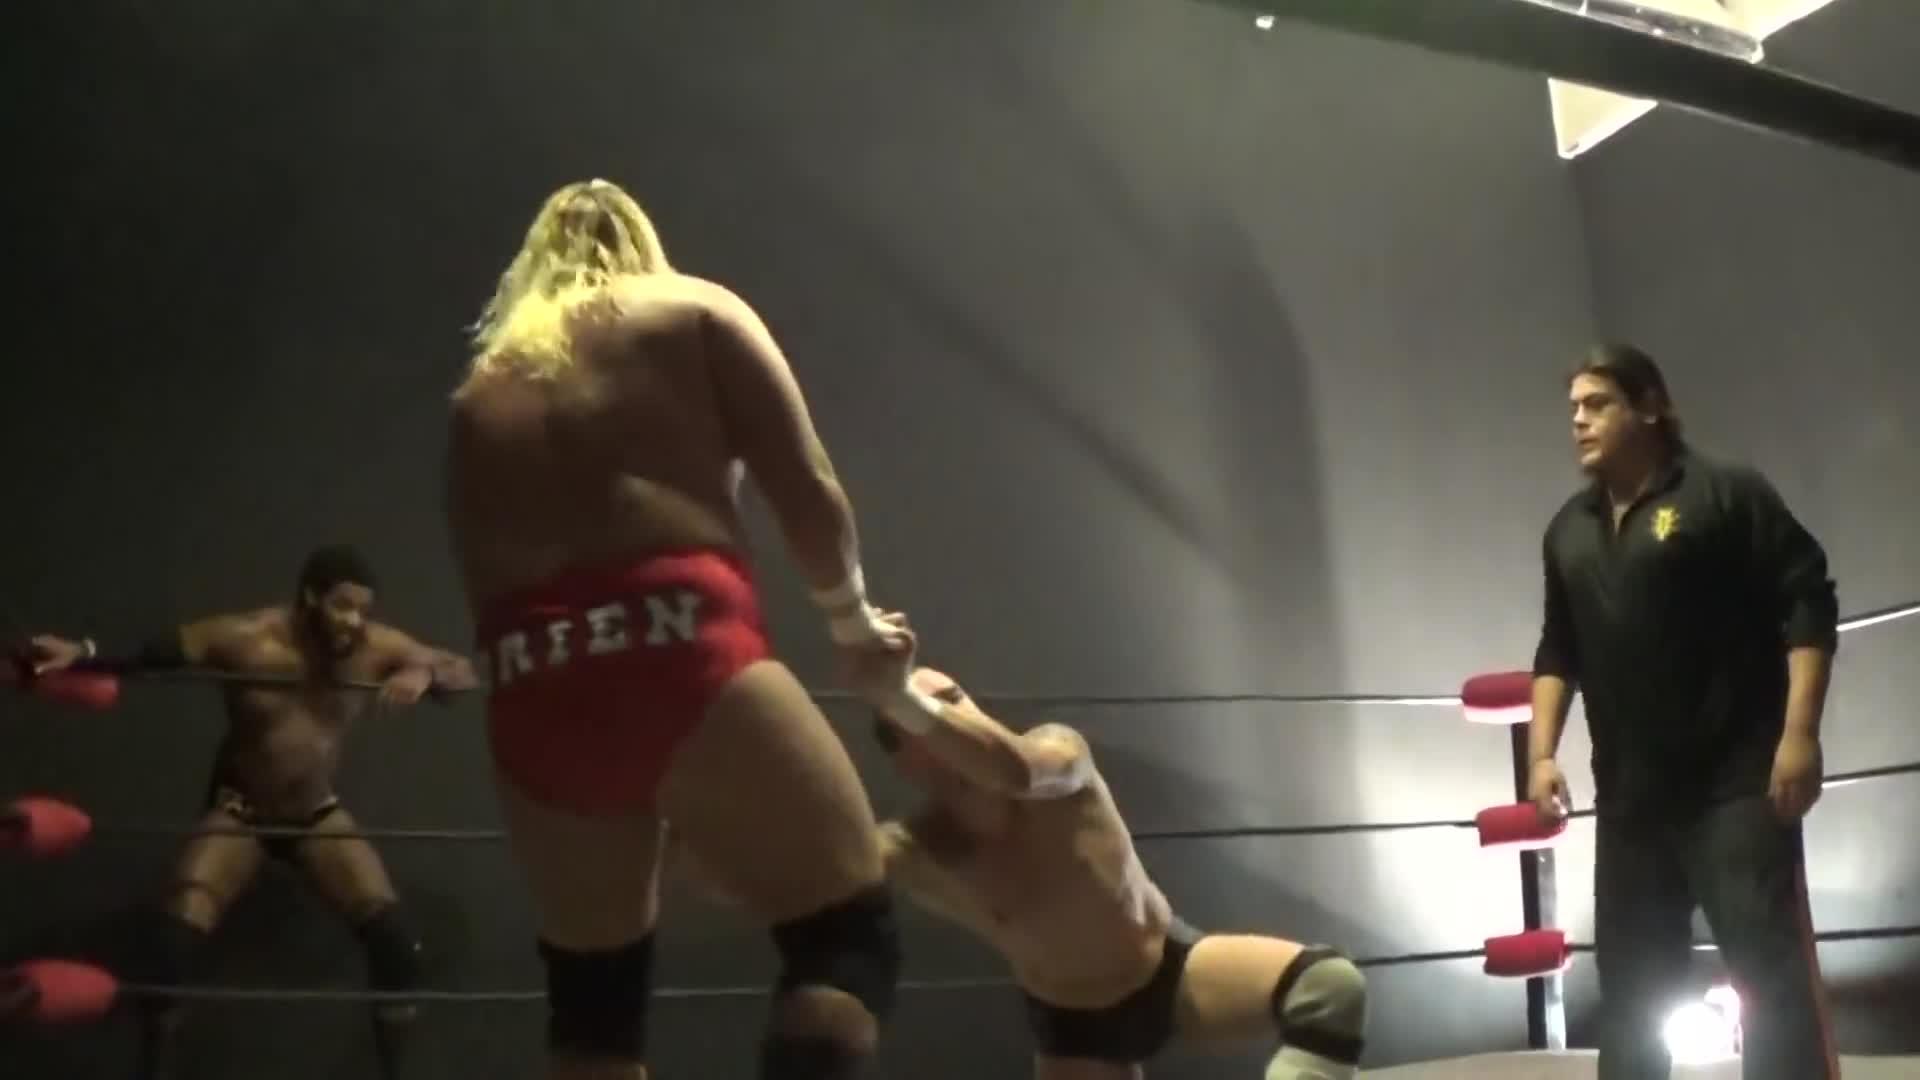 Ricardo Rodriguez, Wrestling, Counter GIFs